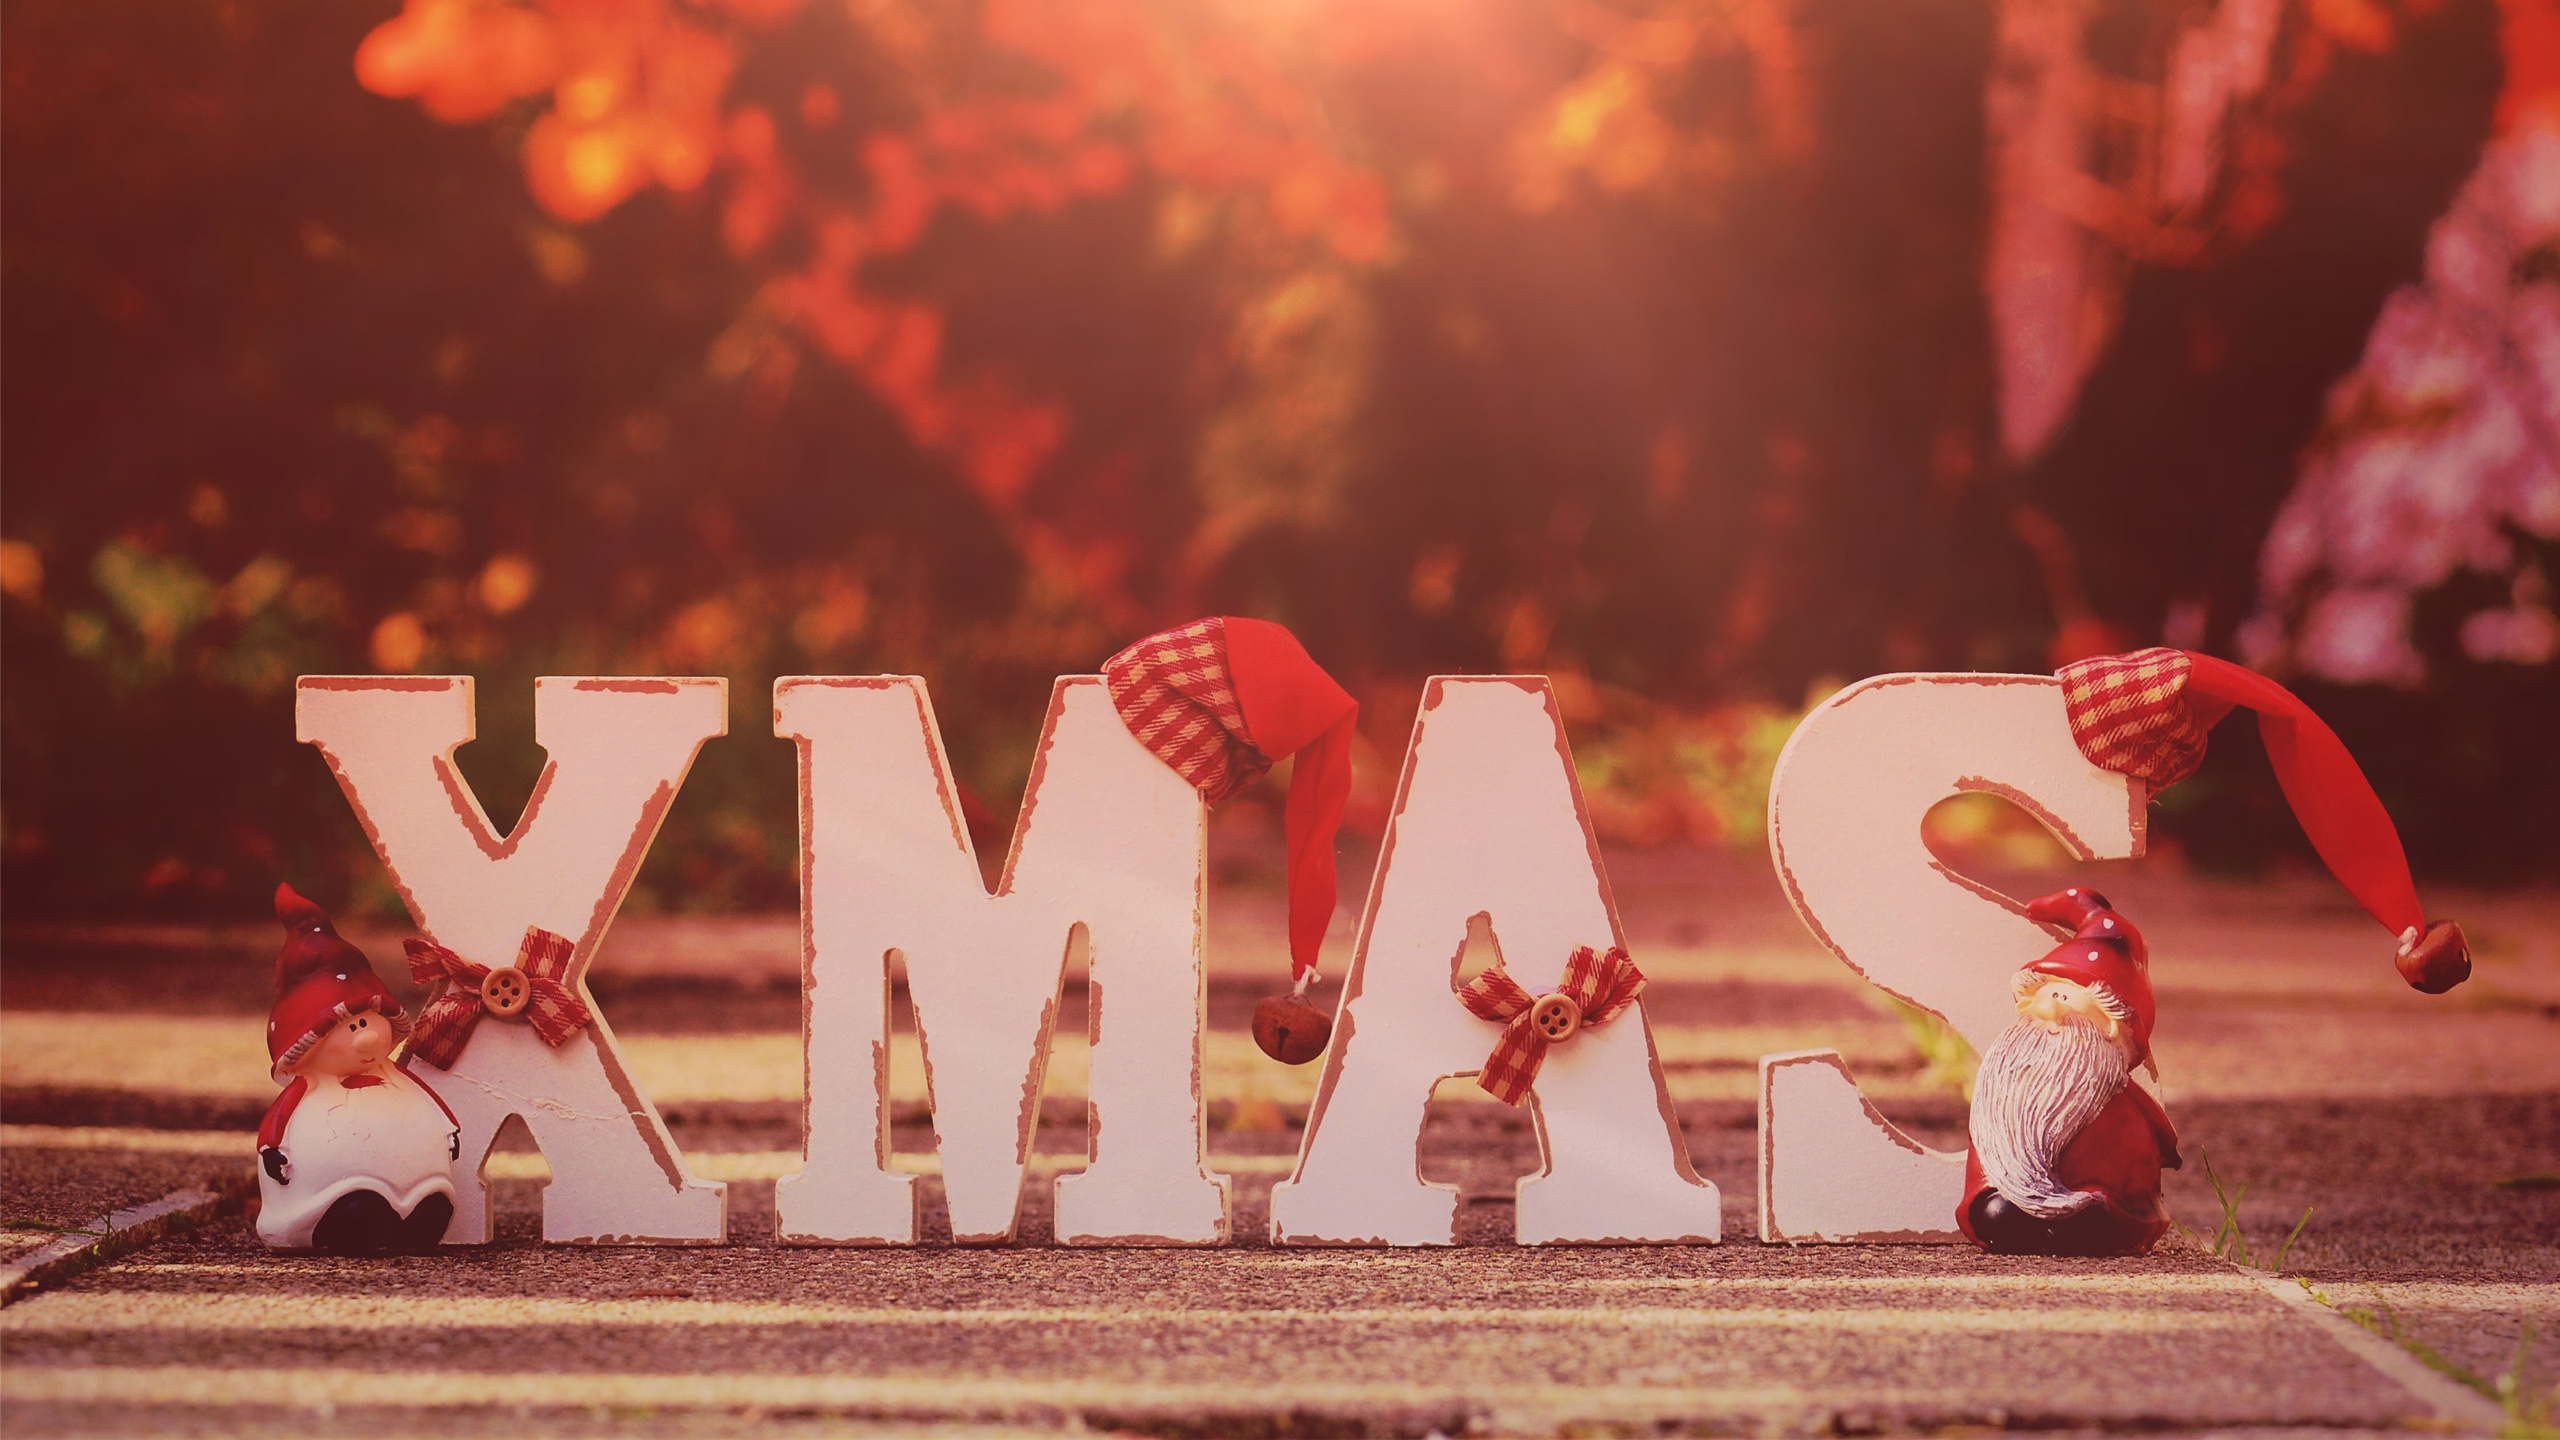 Merry Xmas HD Image